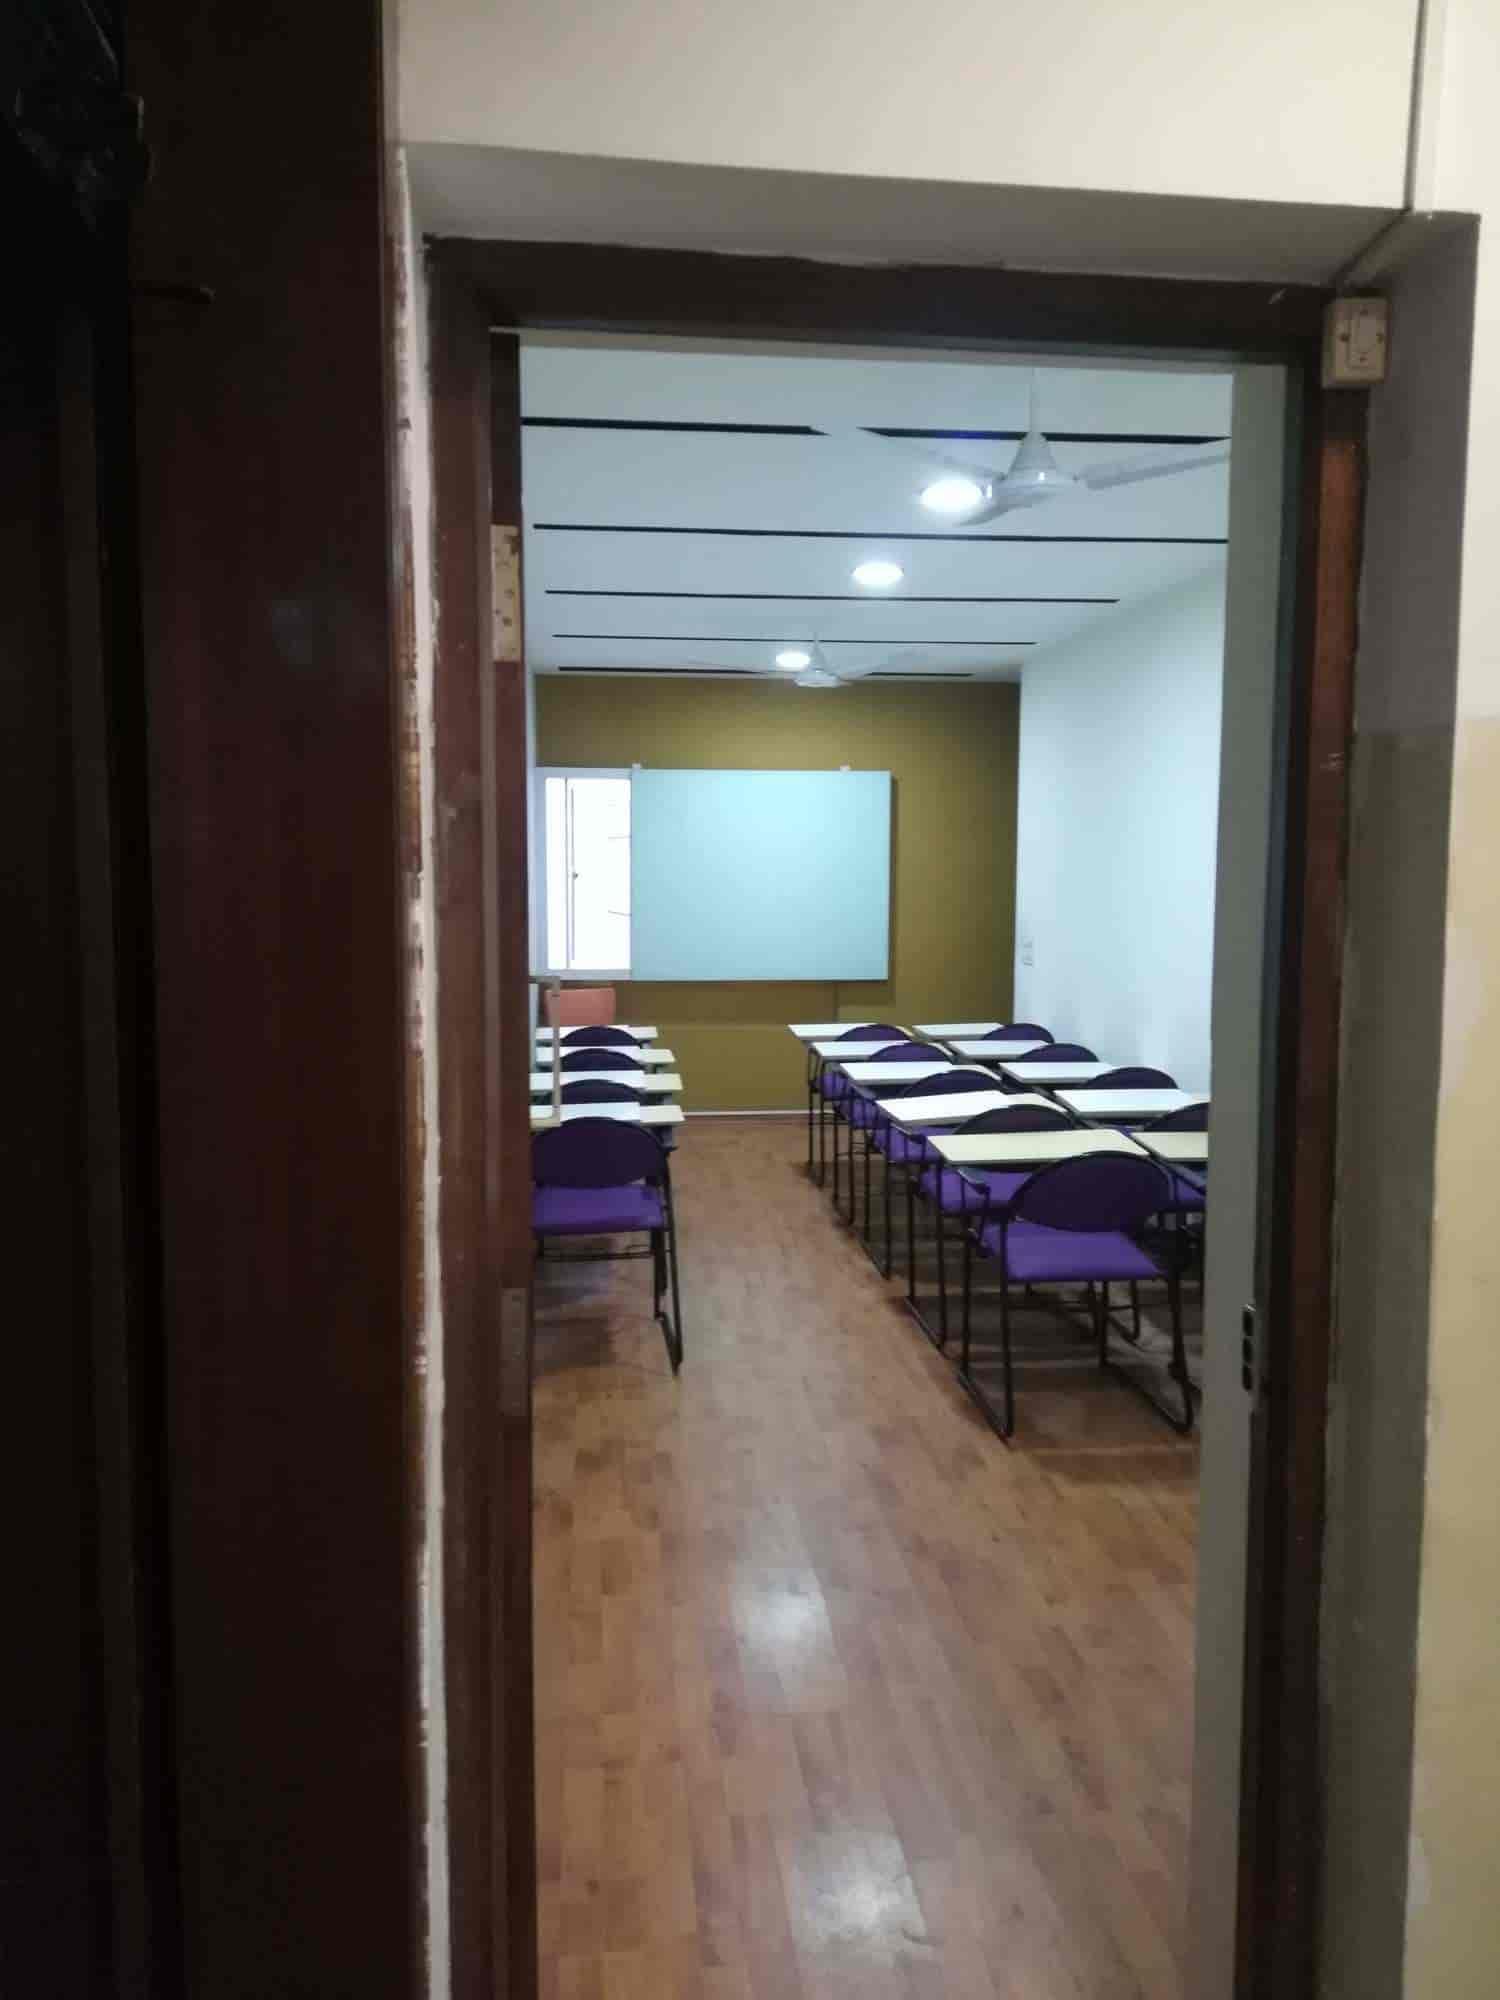 School Of Interior And Architecture